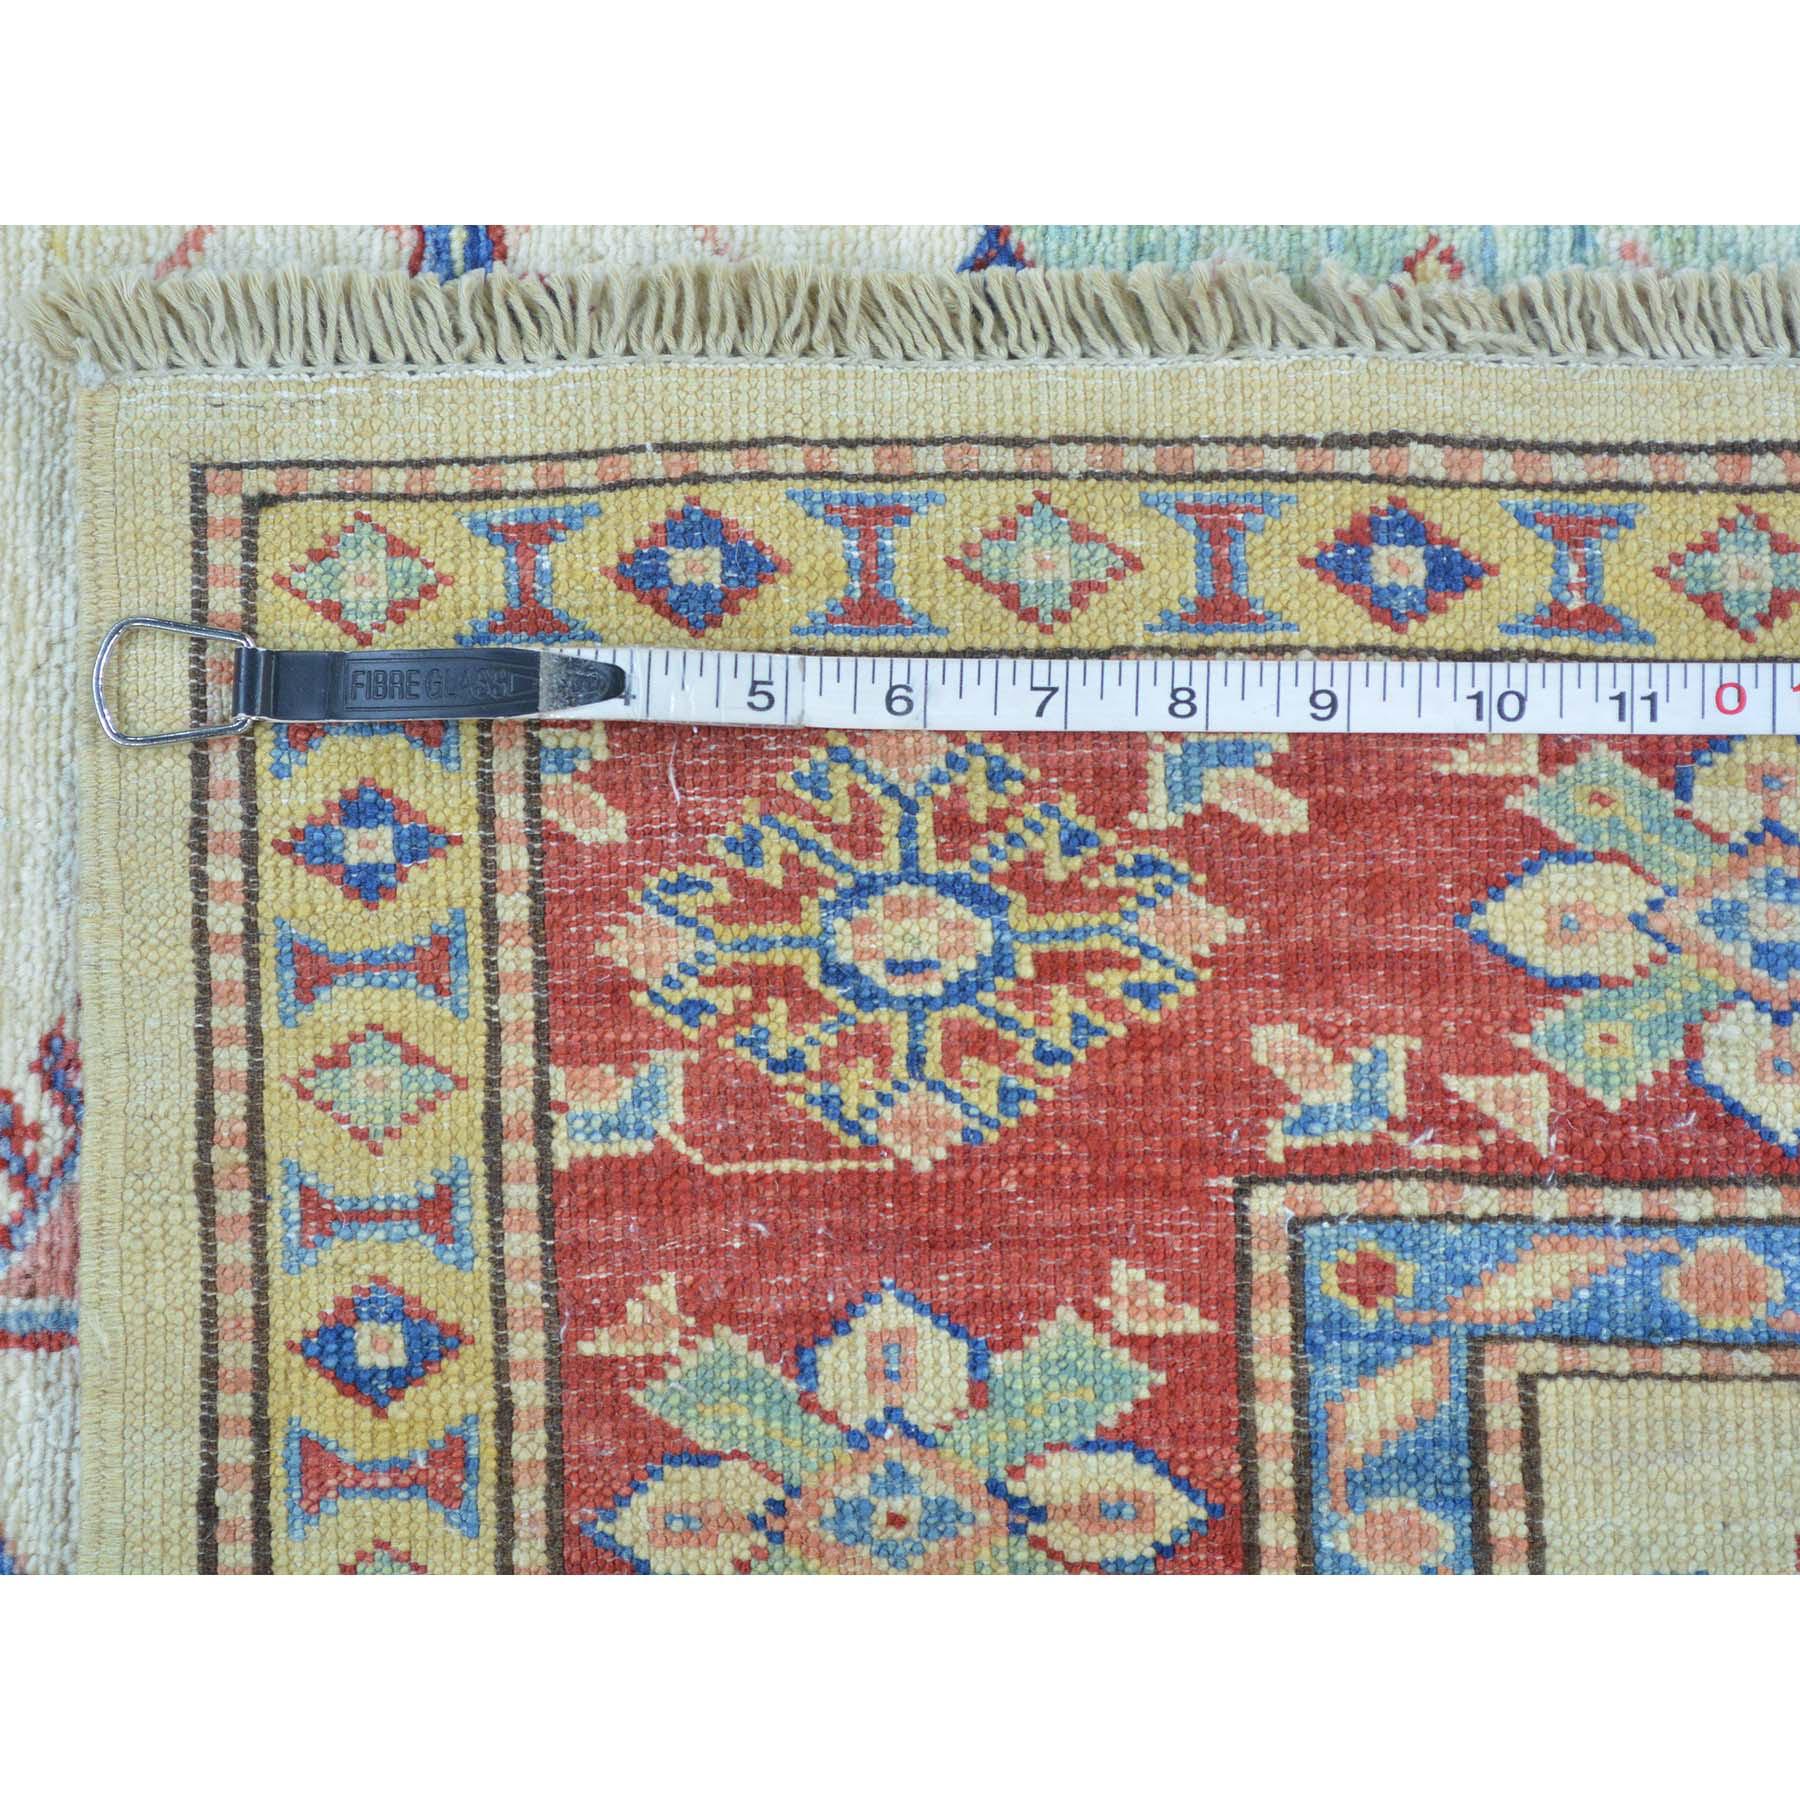 4-10 x6-4  Super Kazak Geometric Design Pure Wool Hand Knotted Rug